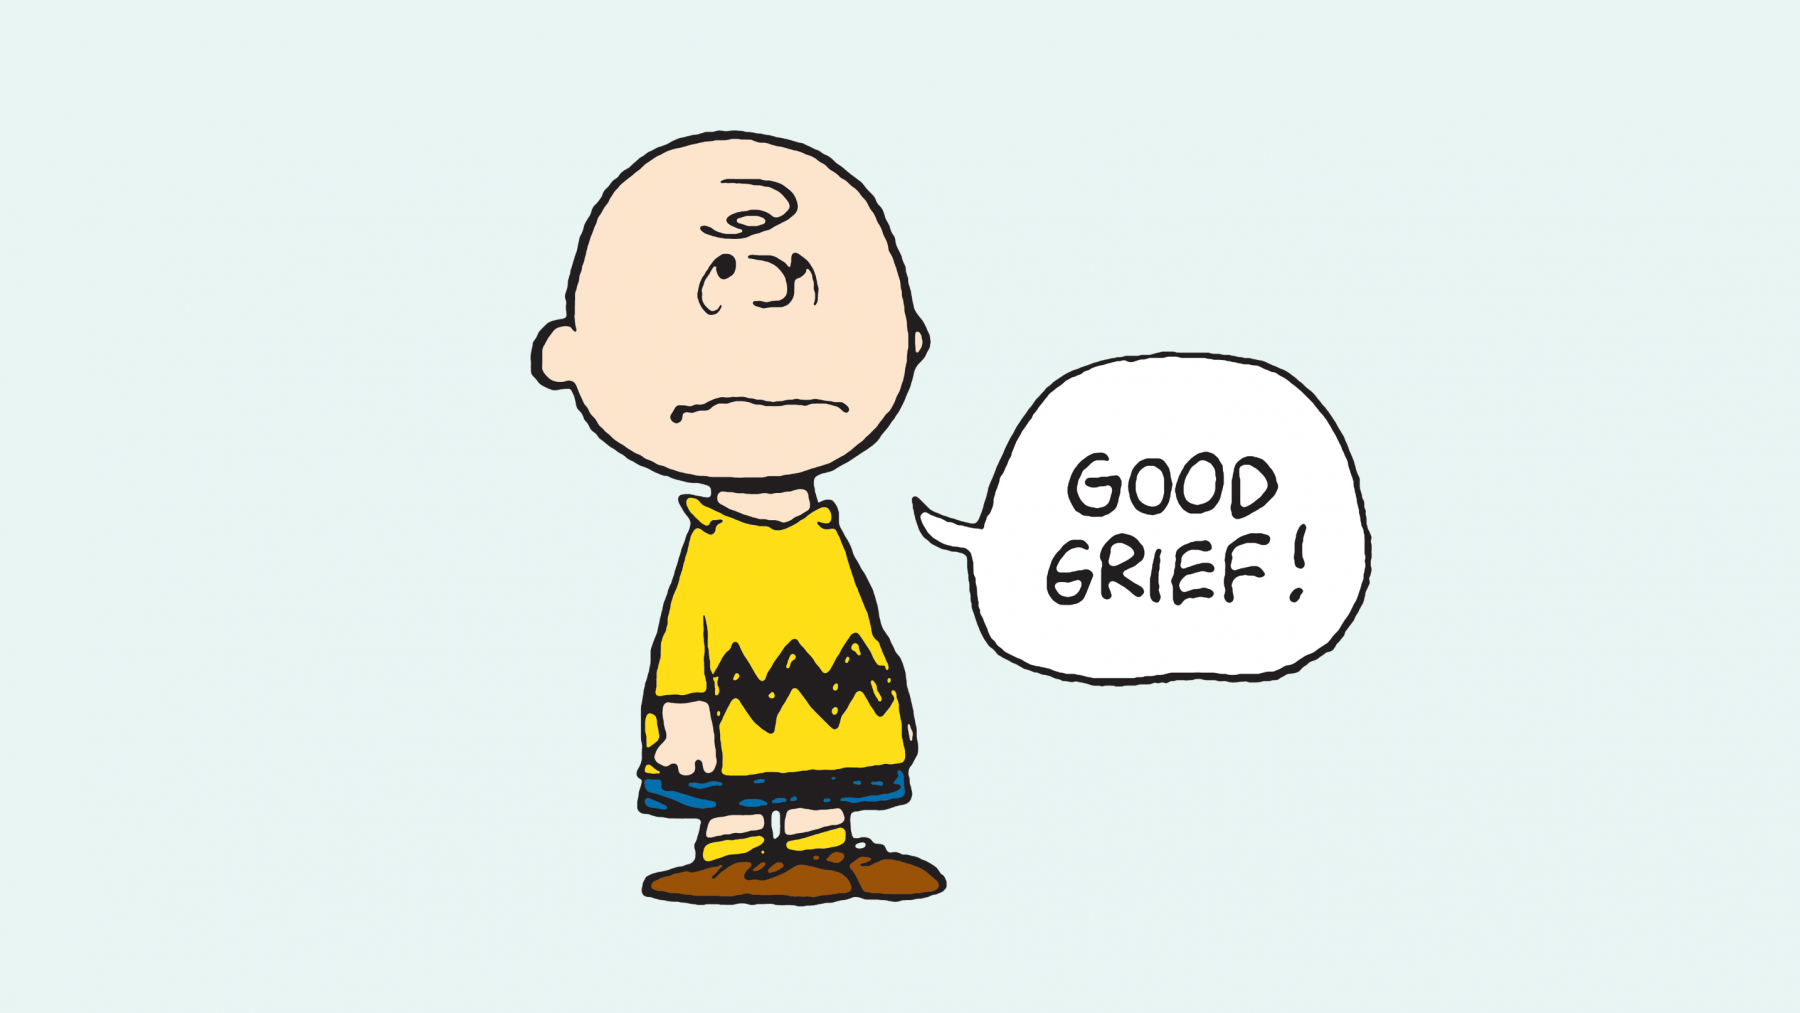 Charlie-Brown-Good-Grief-HEADER_0.png